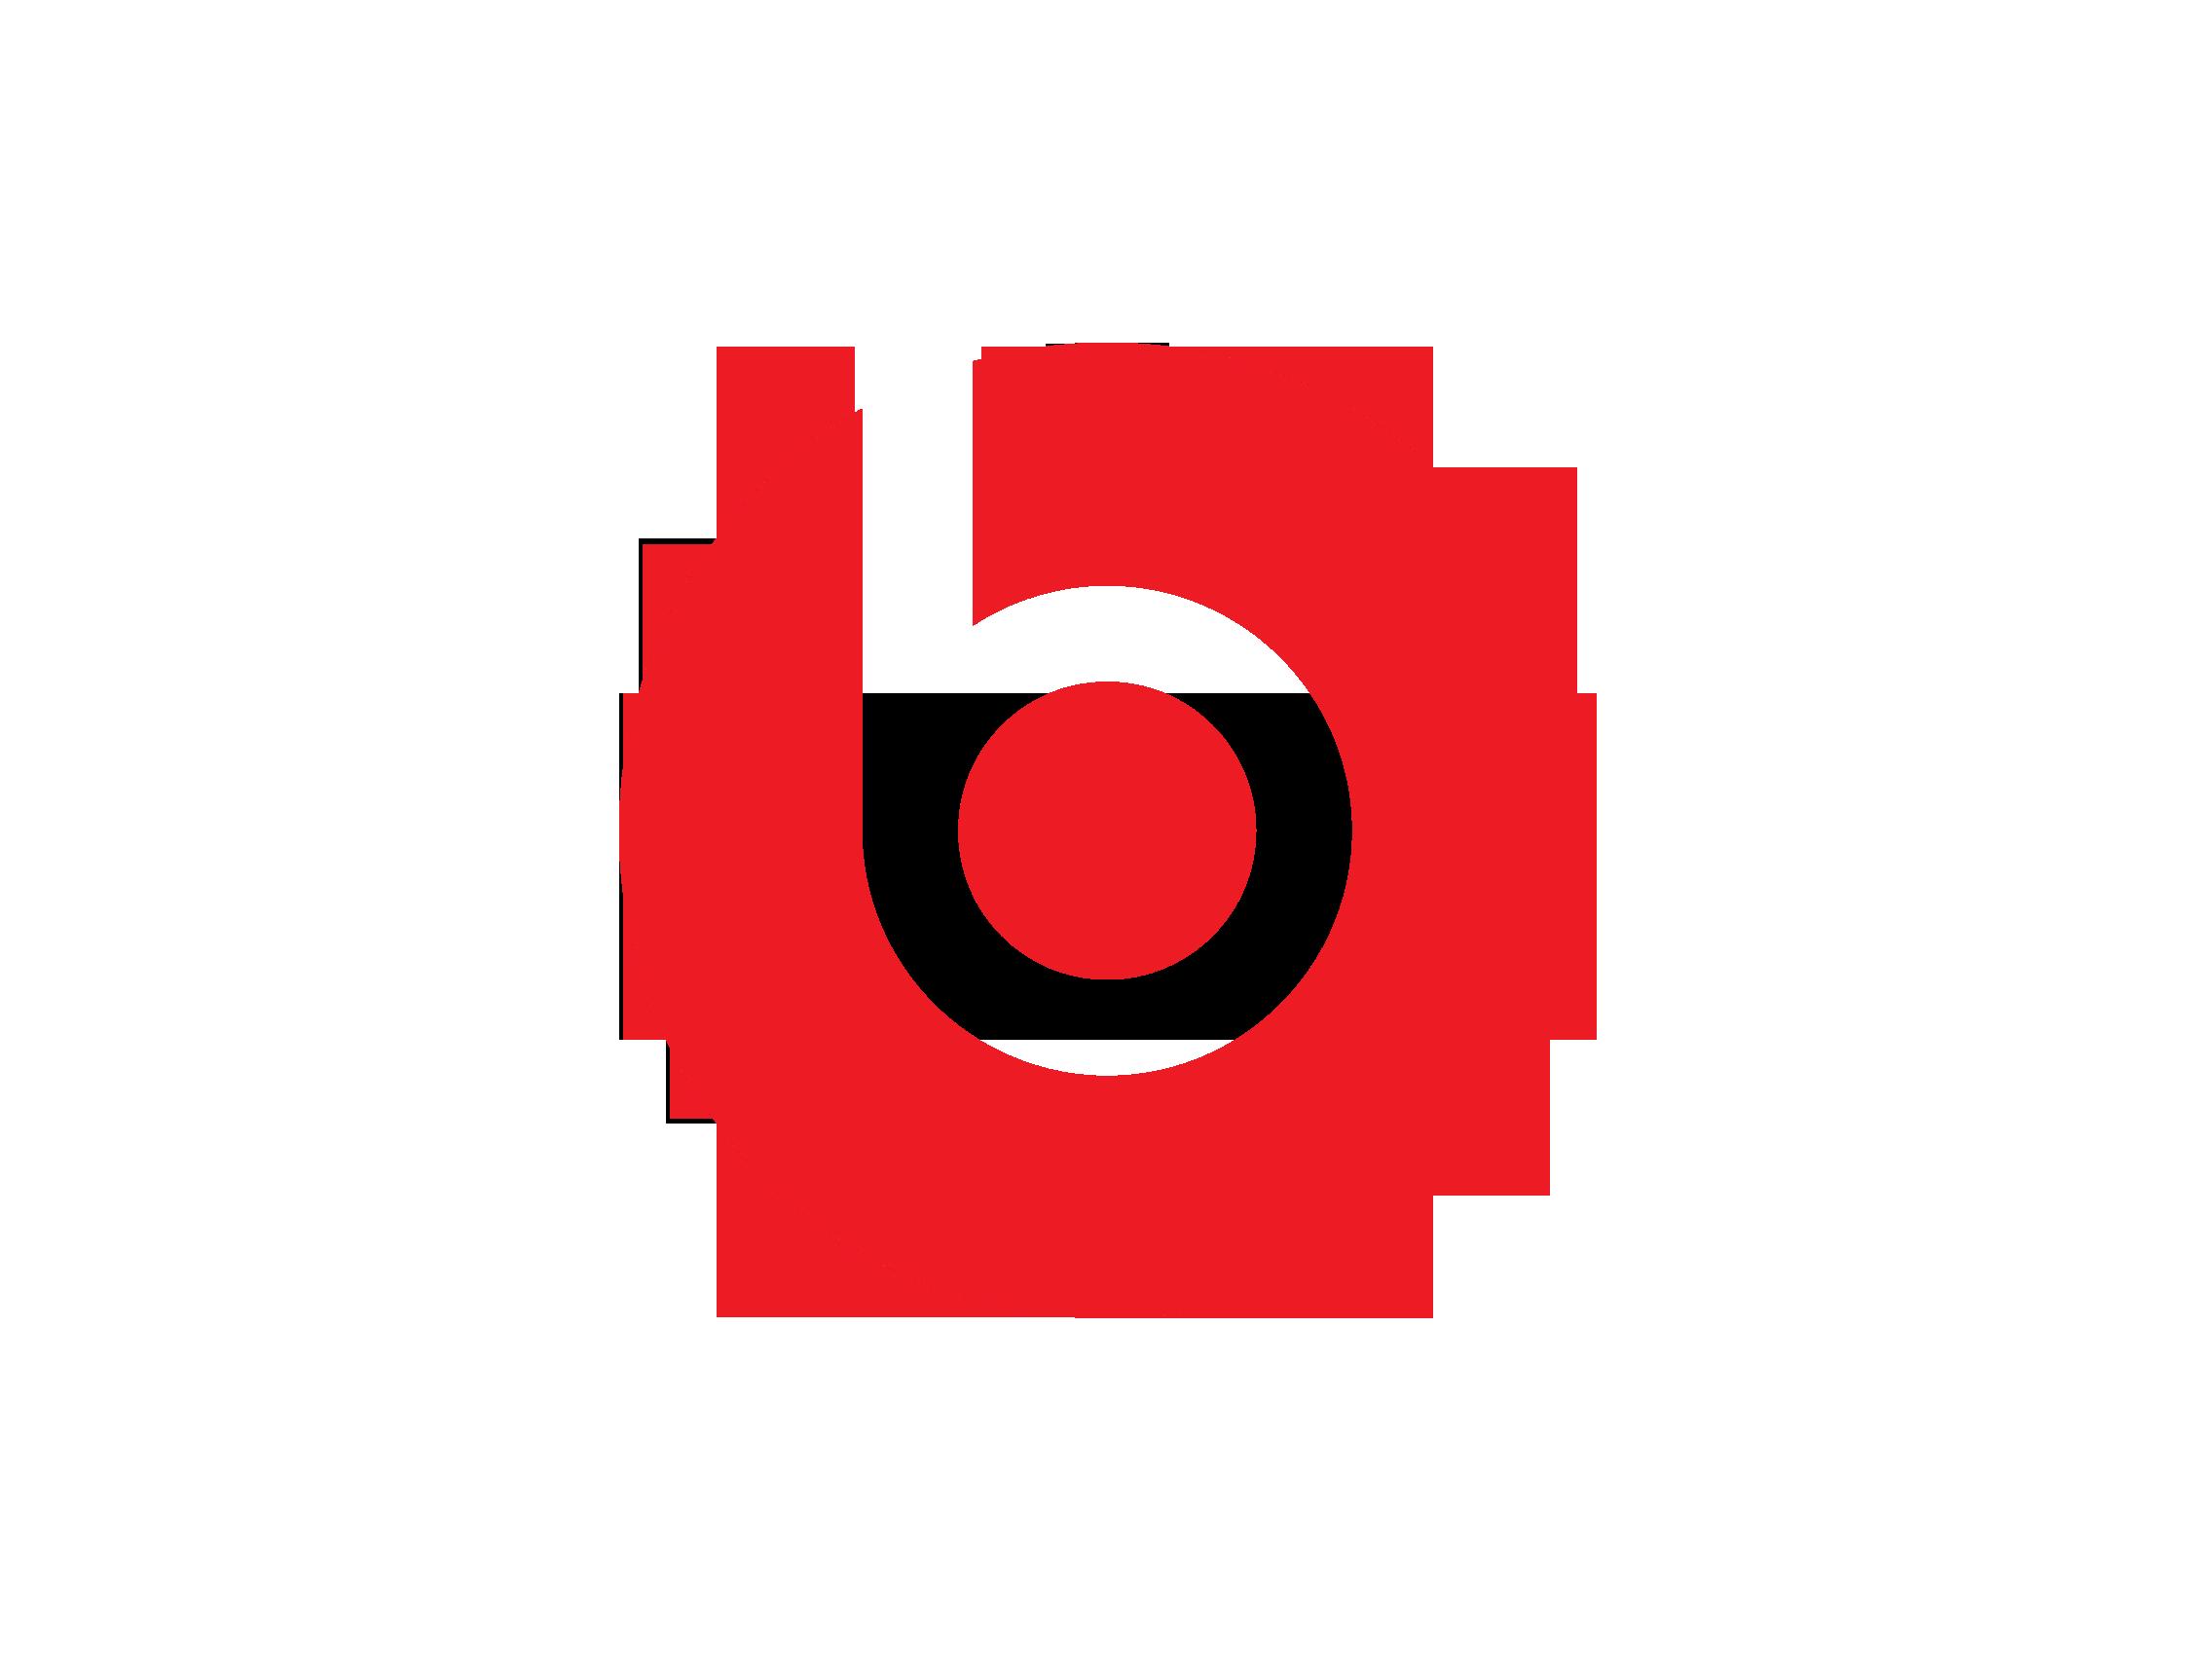 10. Beats